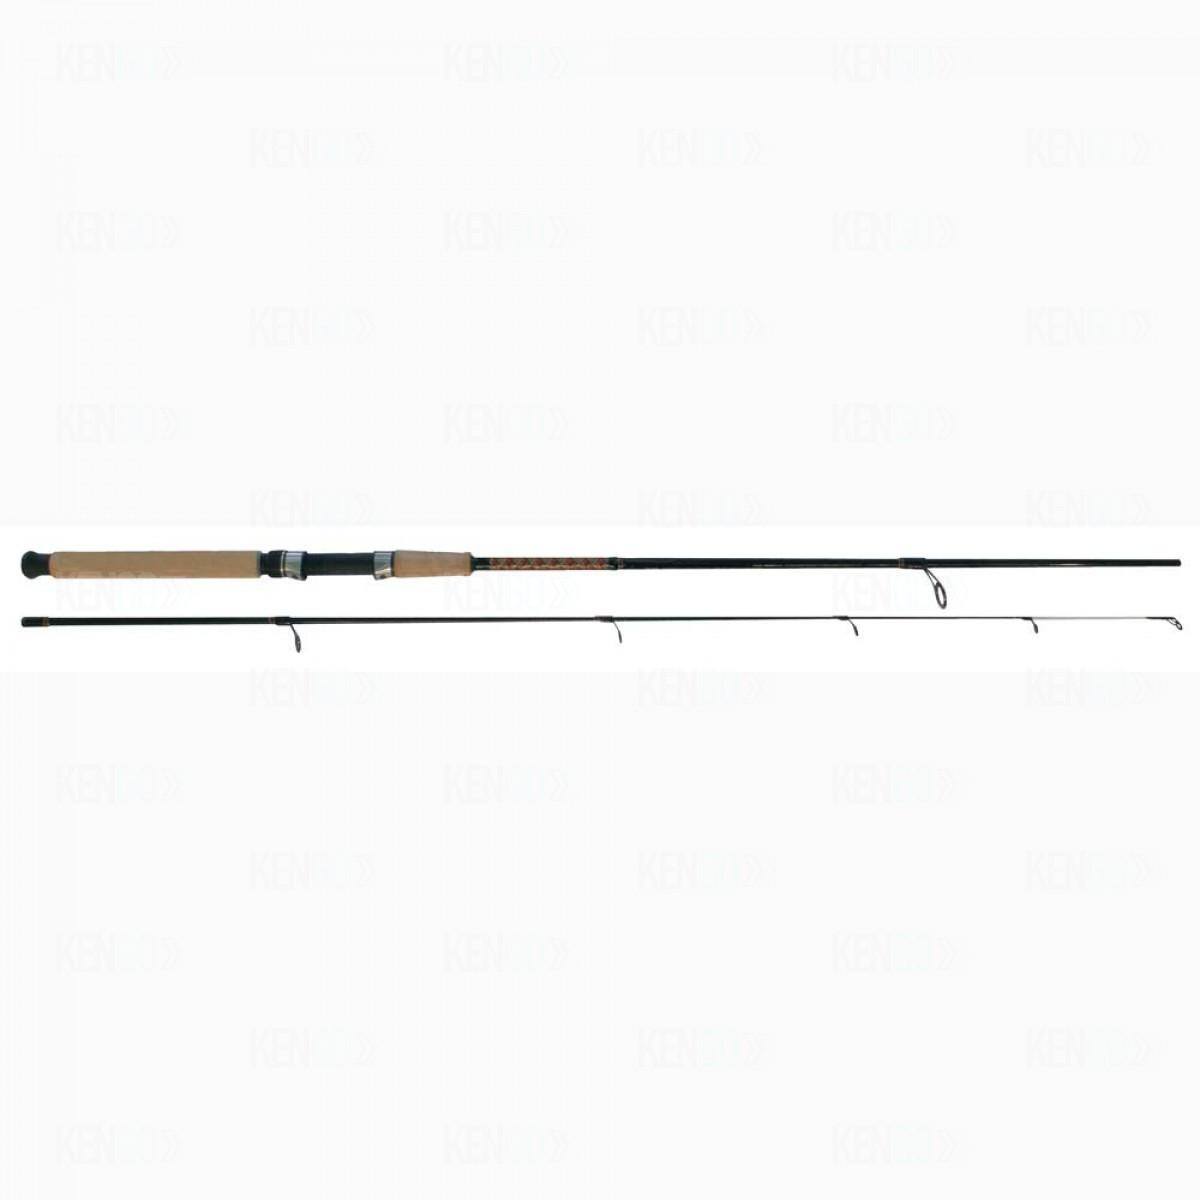 Спиннинг Salmo Power Stick Spin 10-25/2.10 2393-210